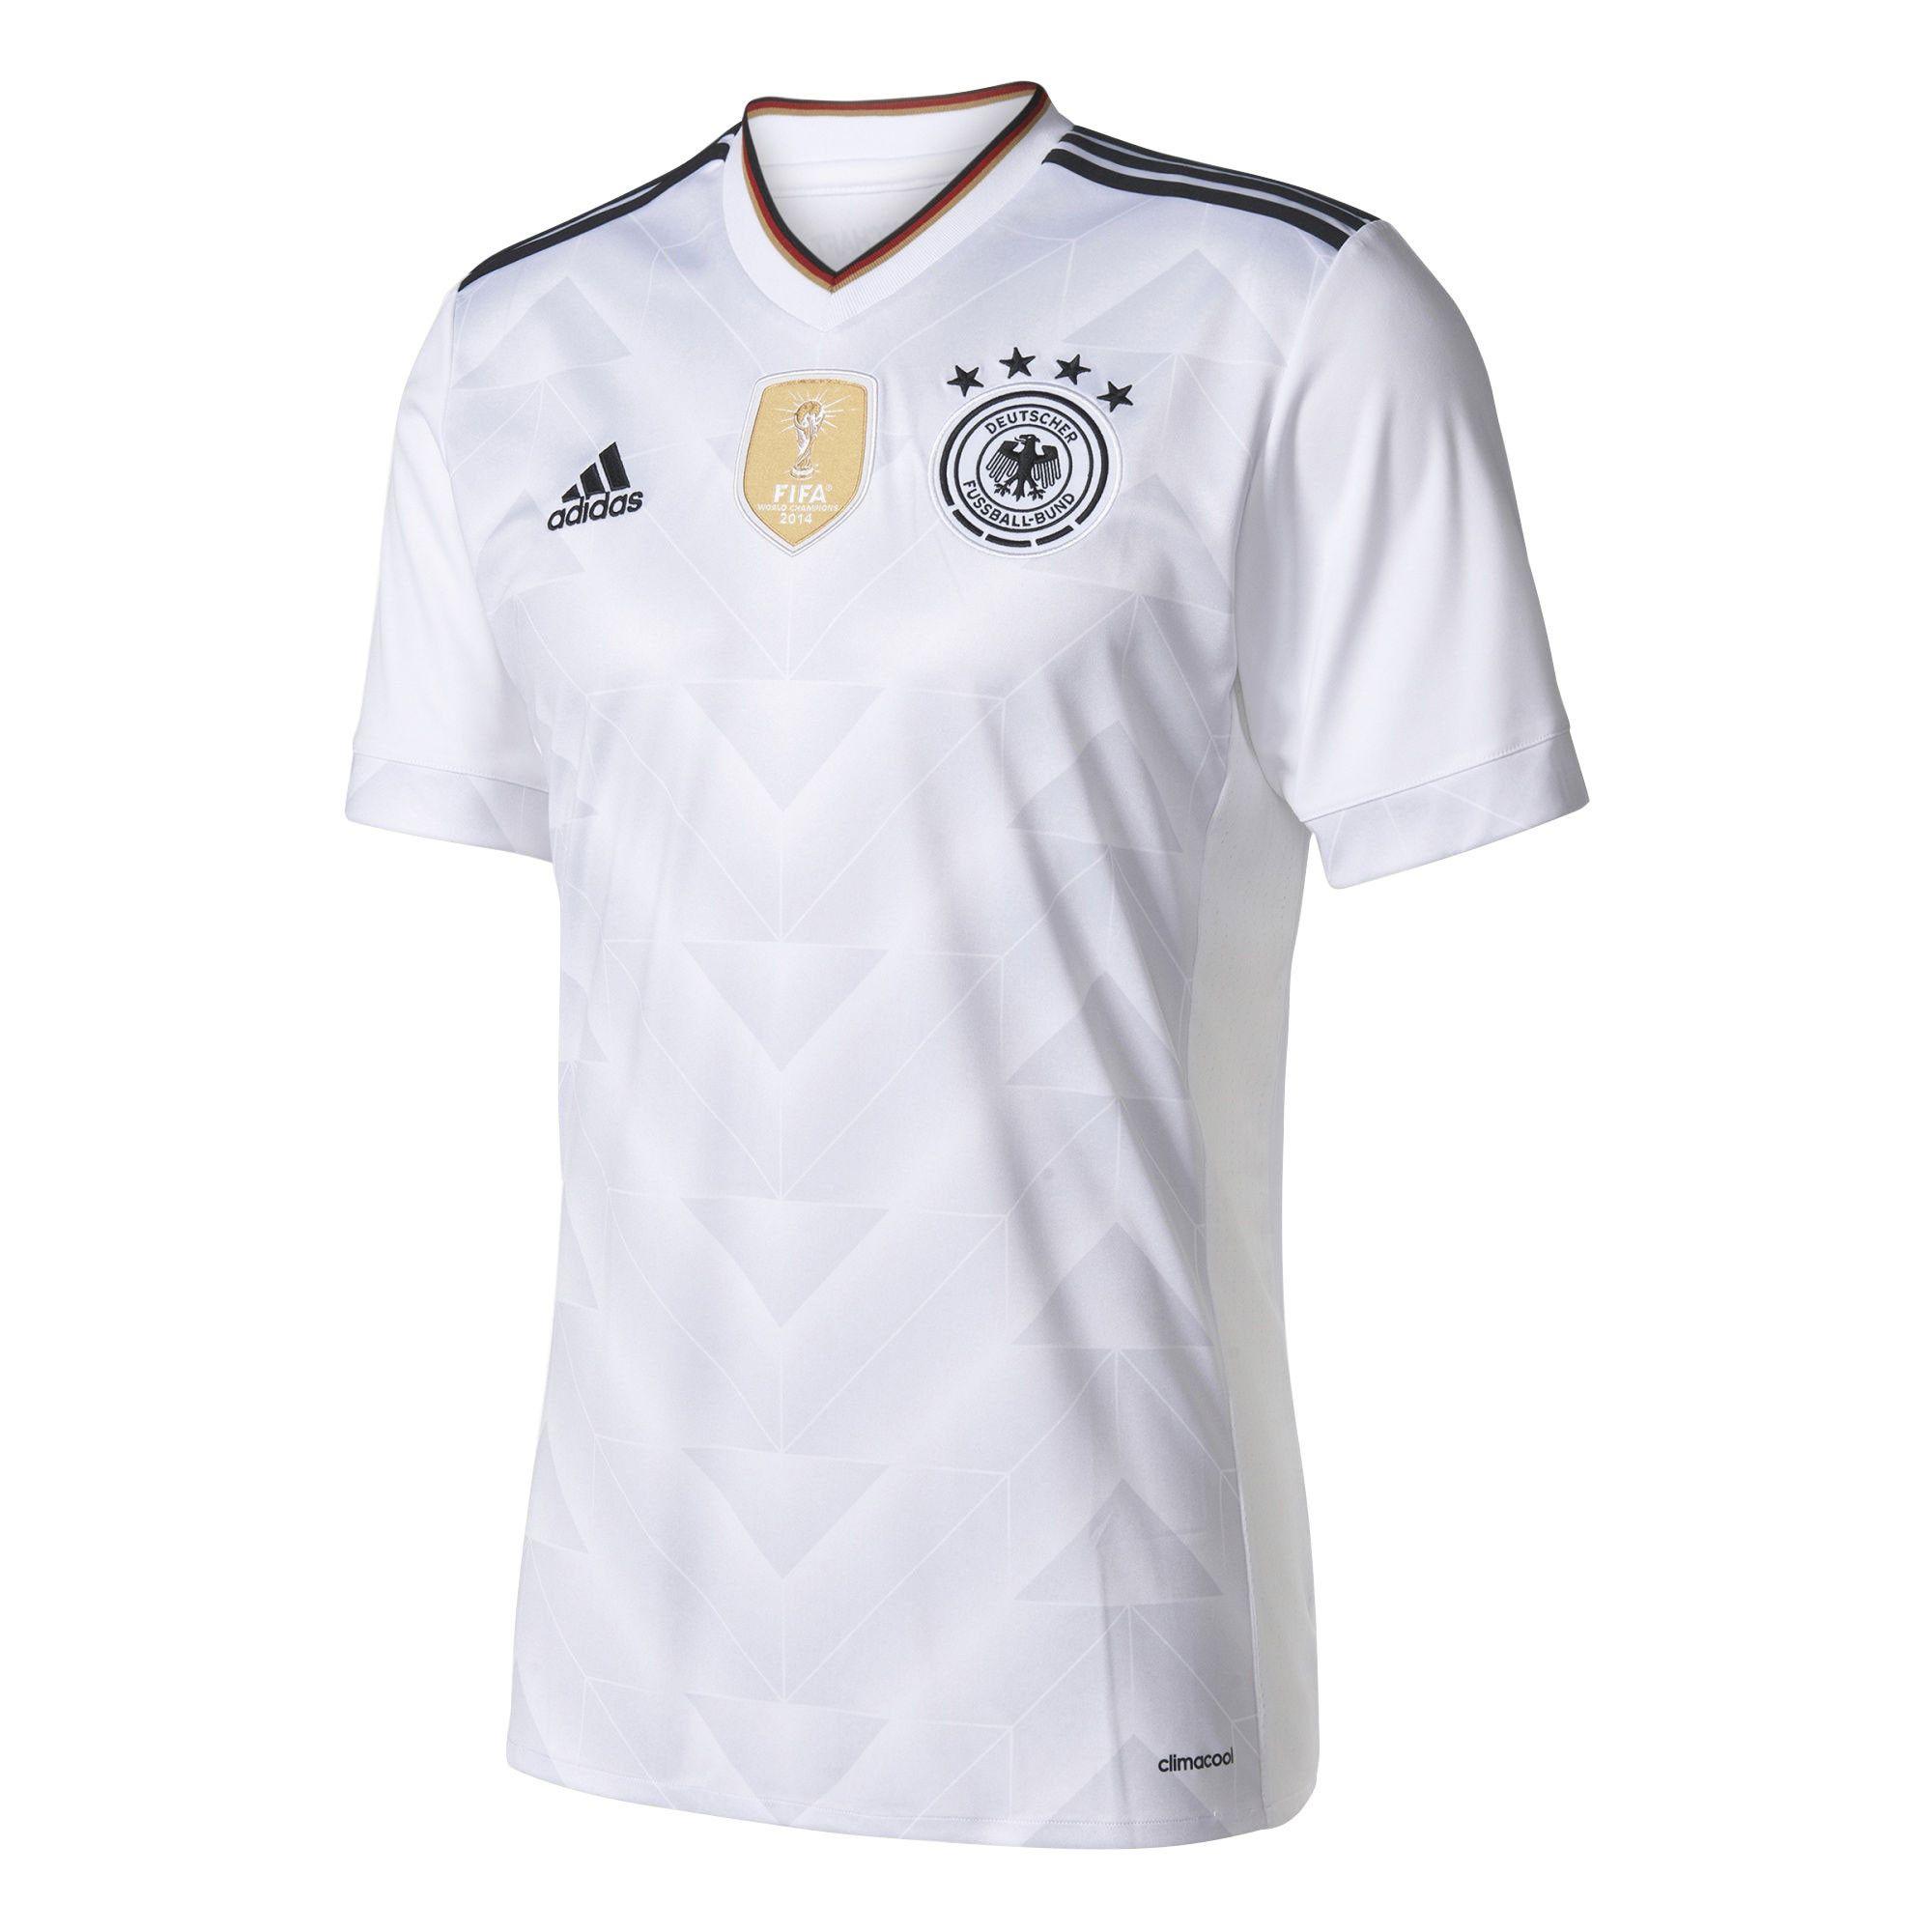 cba57645aa0f4 Camisa Adidas Alemanha 1 Ref.B47873 - Sportland